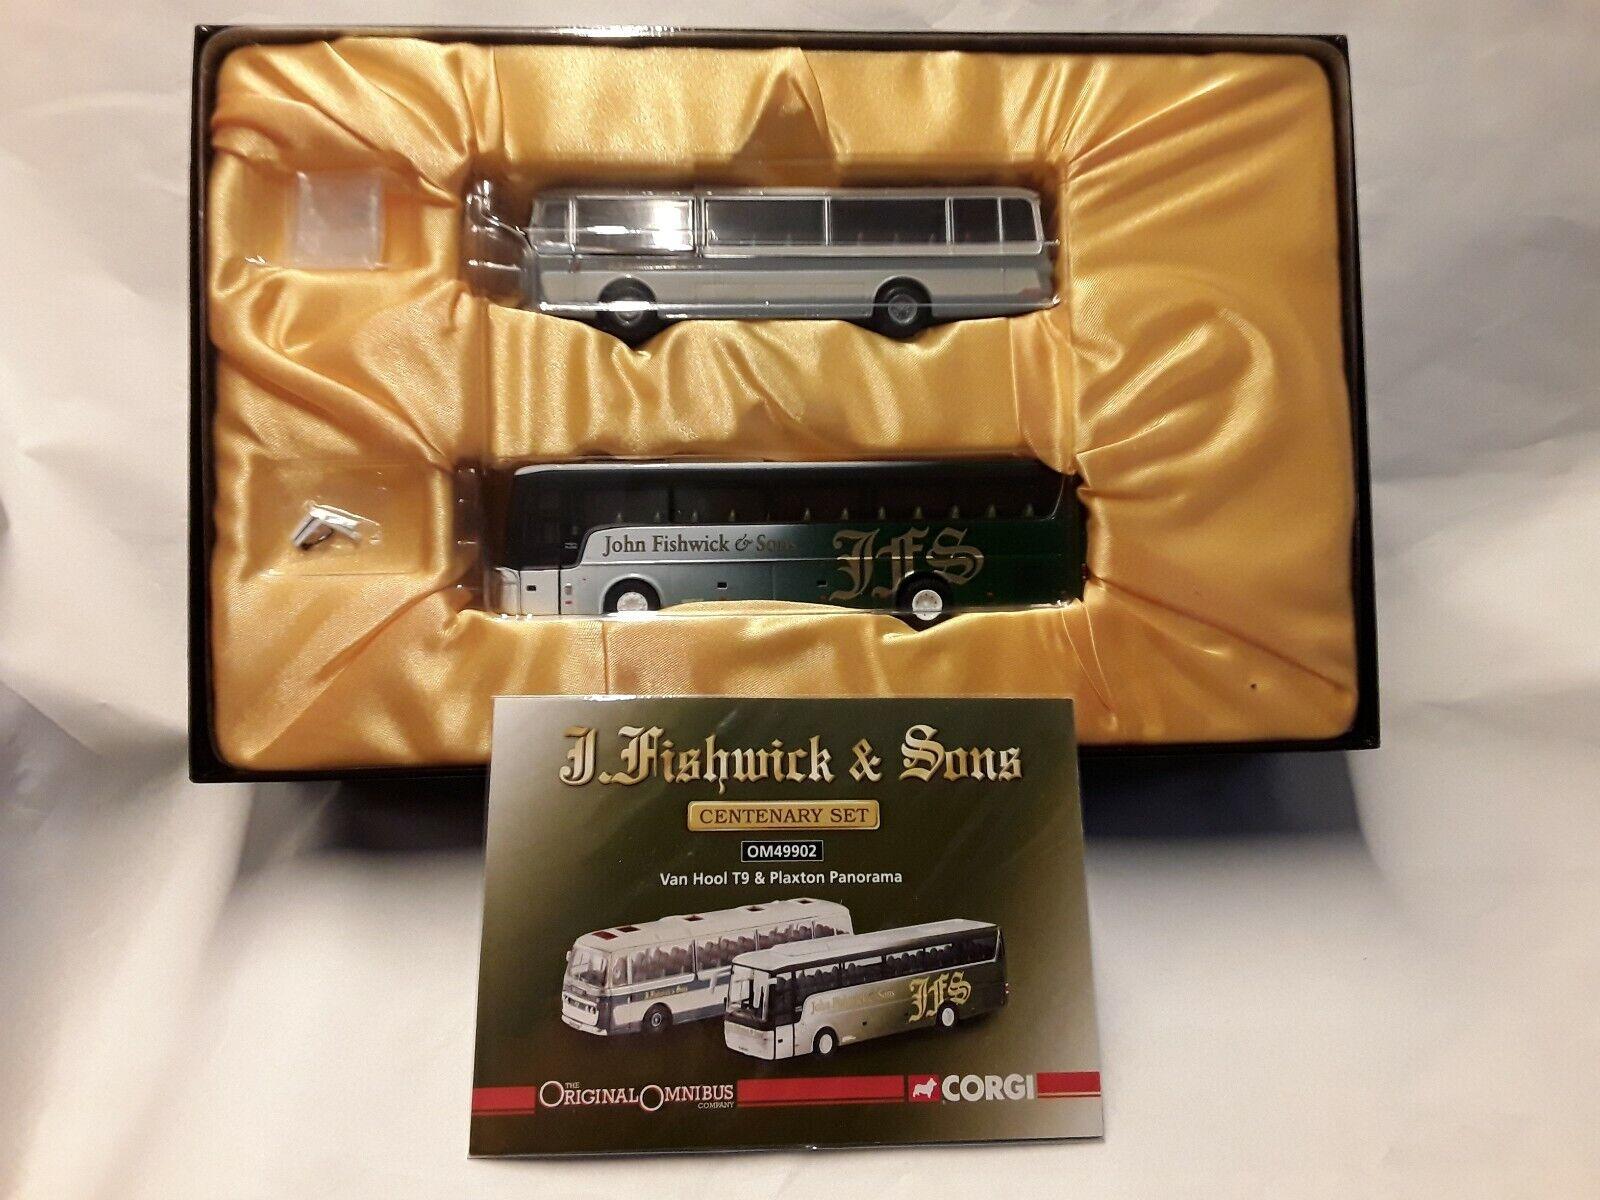 Van HOOL T9 & Plaxton Panorama Centenary  SET  2 x Omnibus  1 76 Corgi